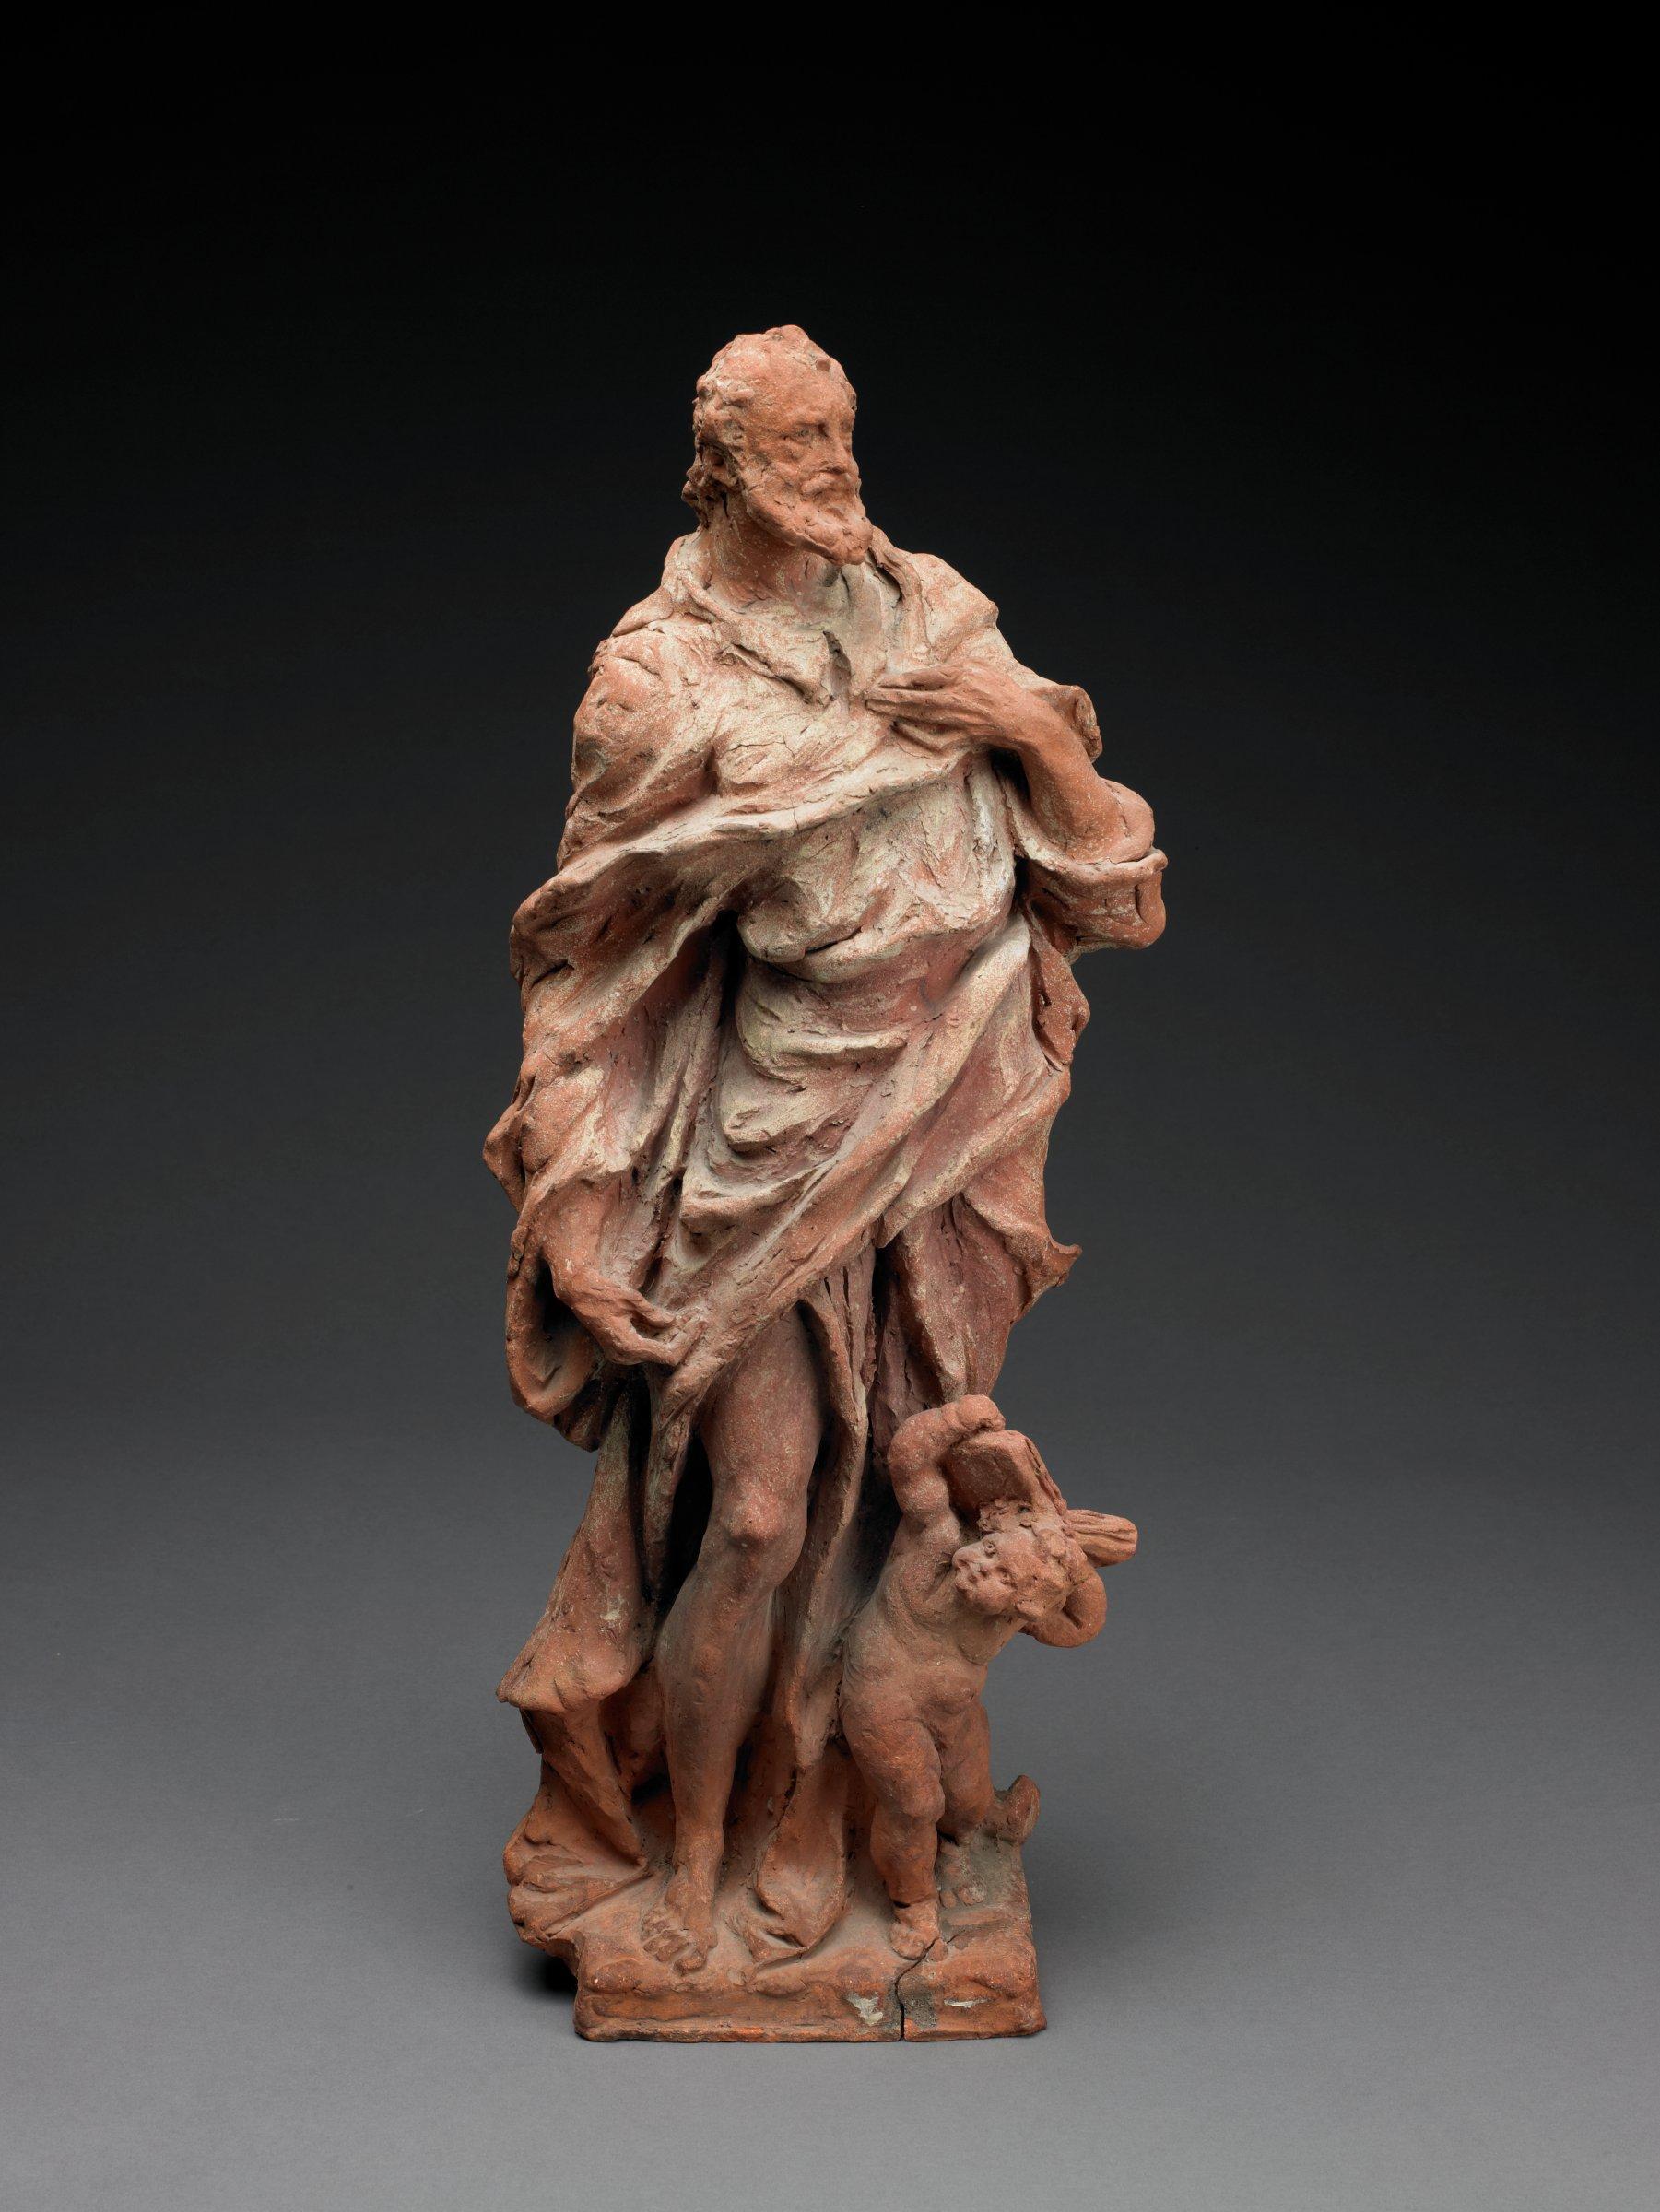 St. Matthew, Giuseppe Bernardi, called Torretto, terracotta